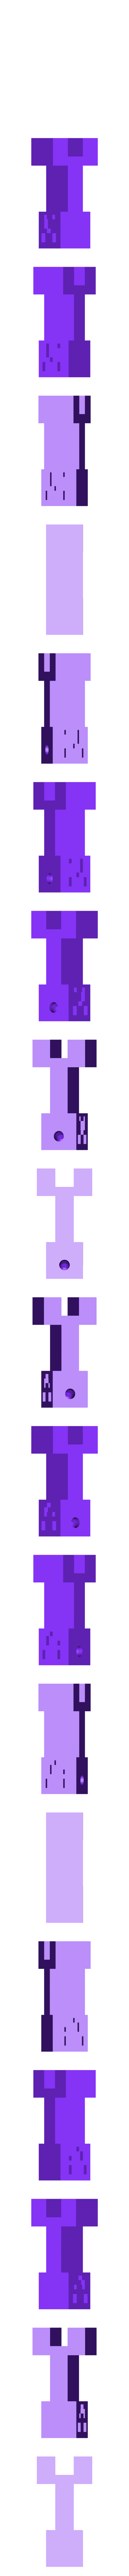 Minecraft_Creeper__Keychain_Nudel_v2_face1.0.stl Download free STL file Minecraft Creeper Keychain • 3D printing design, Jimmydelgadinho45